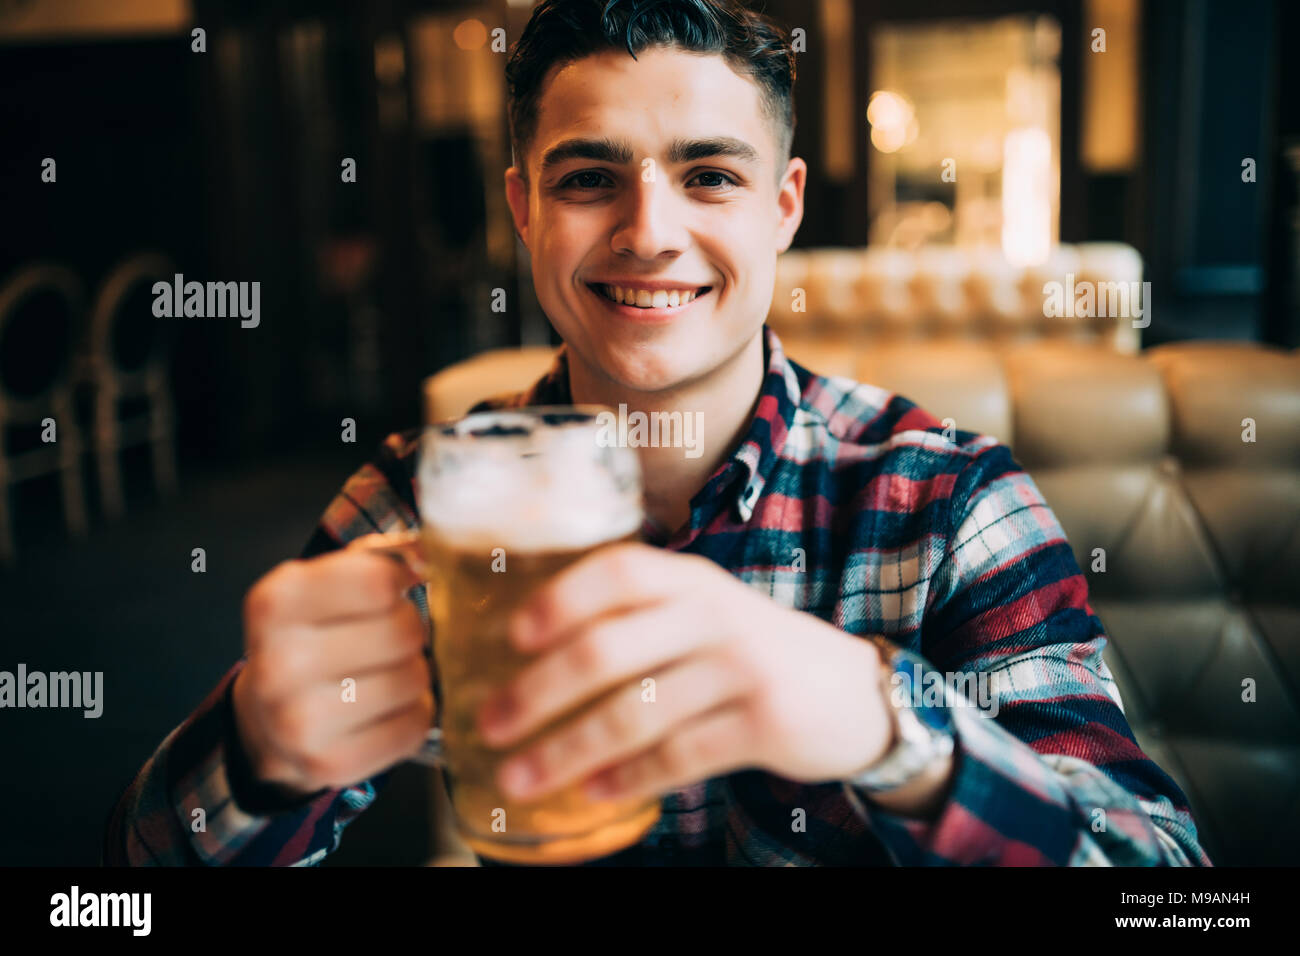 Man Bier trinkt. Junger Mann, Trinken, Bier, während Sitzen an der Theke Stockbild